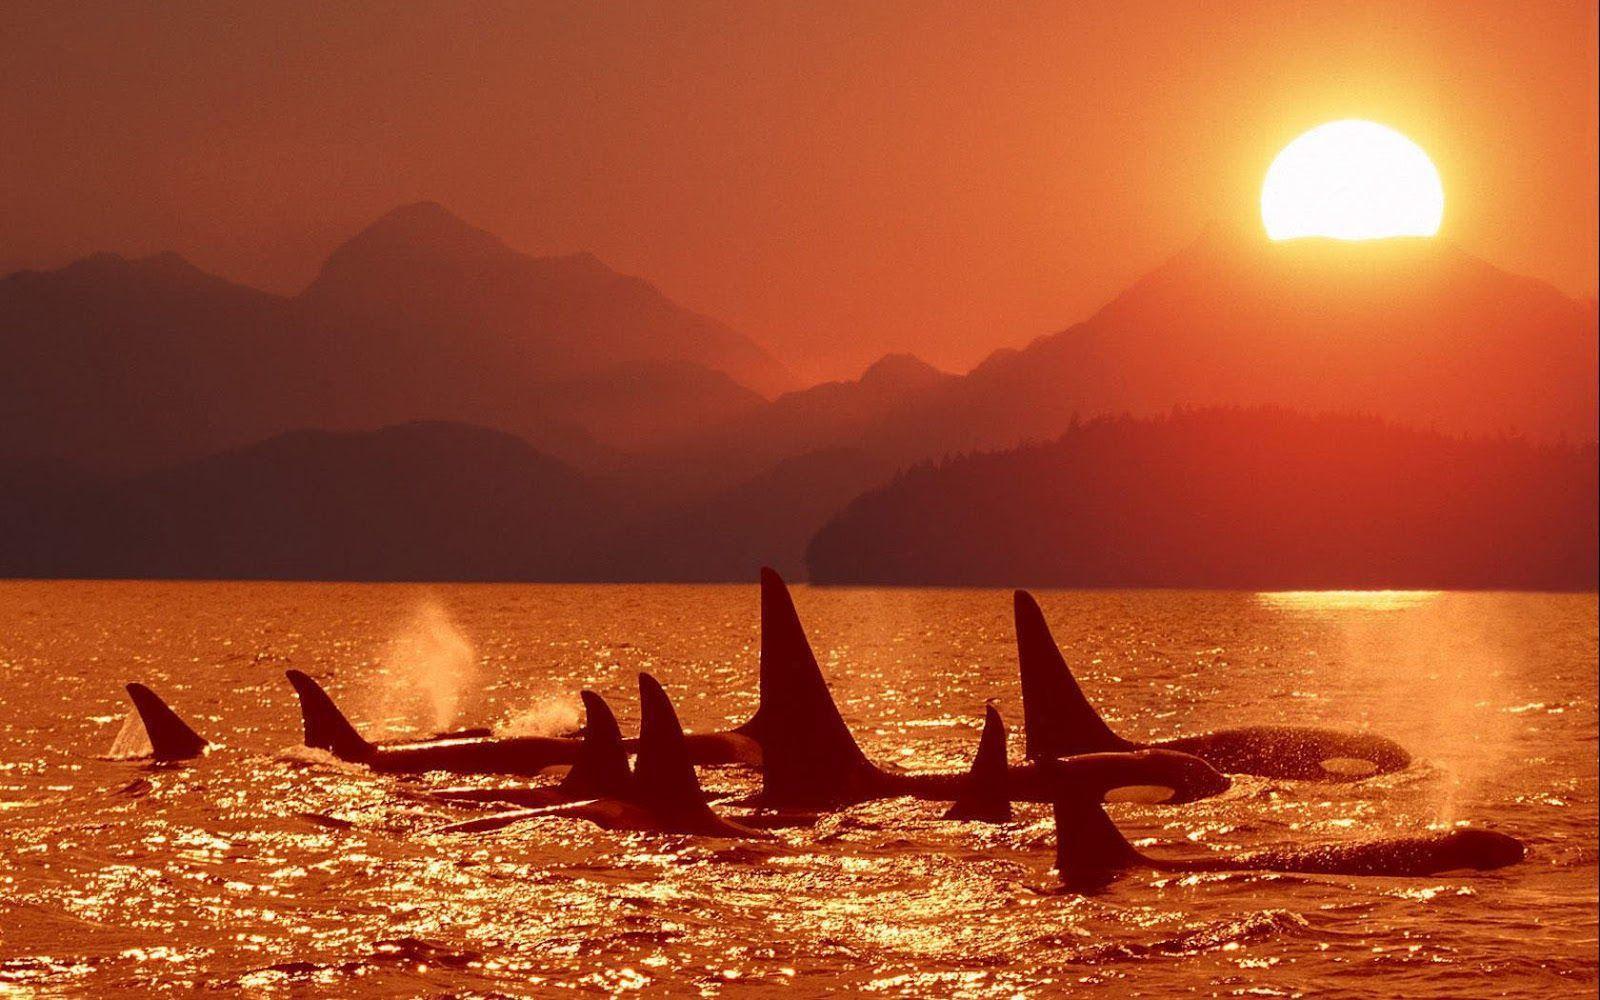 Love Killer Hd Wallpaper : Killer Whales Wallpapers - Wallpaper cave